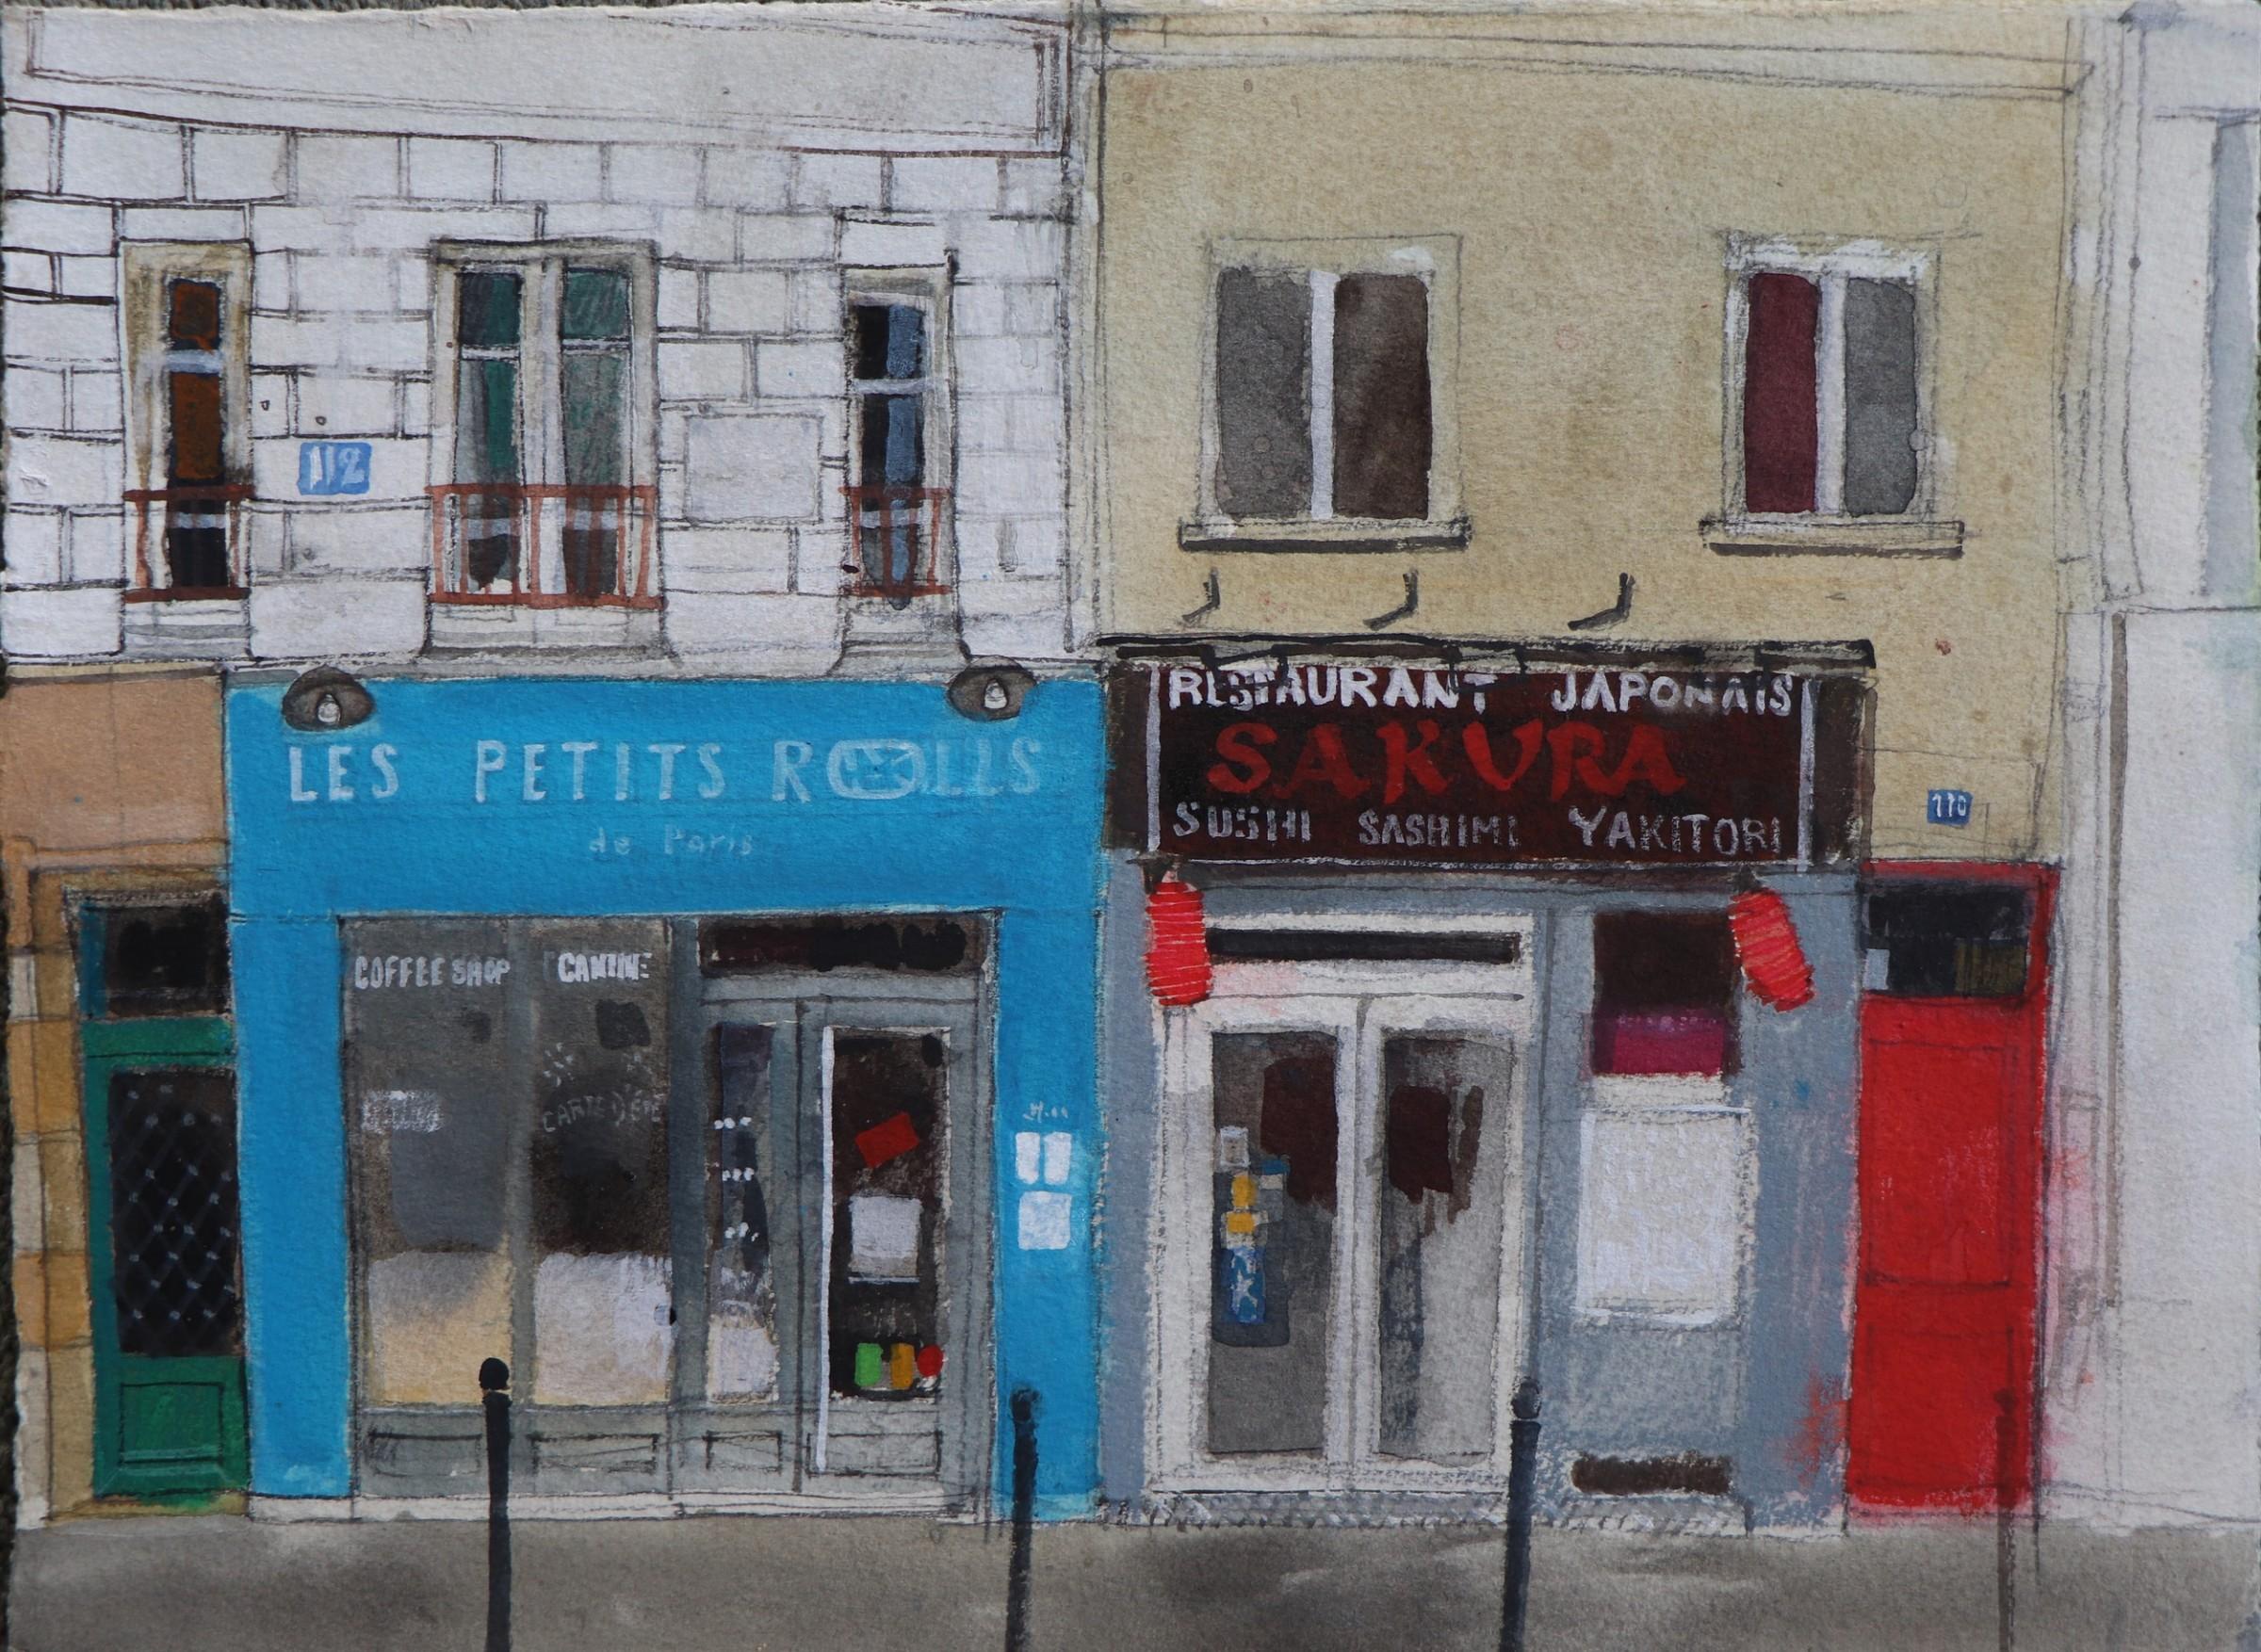 "<span class=""link fancybox-details-link""><a href=""/artists/96-peter-quinn/works/12655-peter-quinn-coffee-and-sushi-paris/"">View Detail Page</a></span><div class=""artist""><span class=""artist""><strong>Peter Quinn</strong></span></div><div class=""title""><em>Coffee and Sushi, Paris</em></div><div class=""medium"">watercolour on paper</div><div class=""dimensions"">Artwork: 38 x 28cm</div><div class=""price"">£625.00</div>"